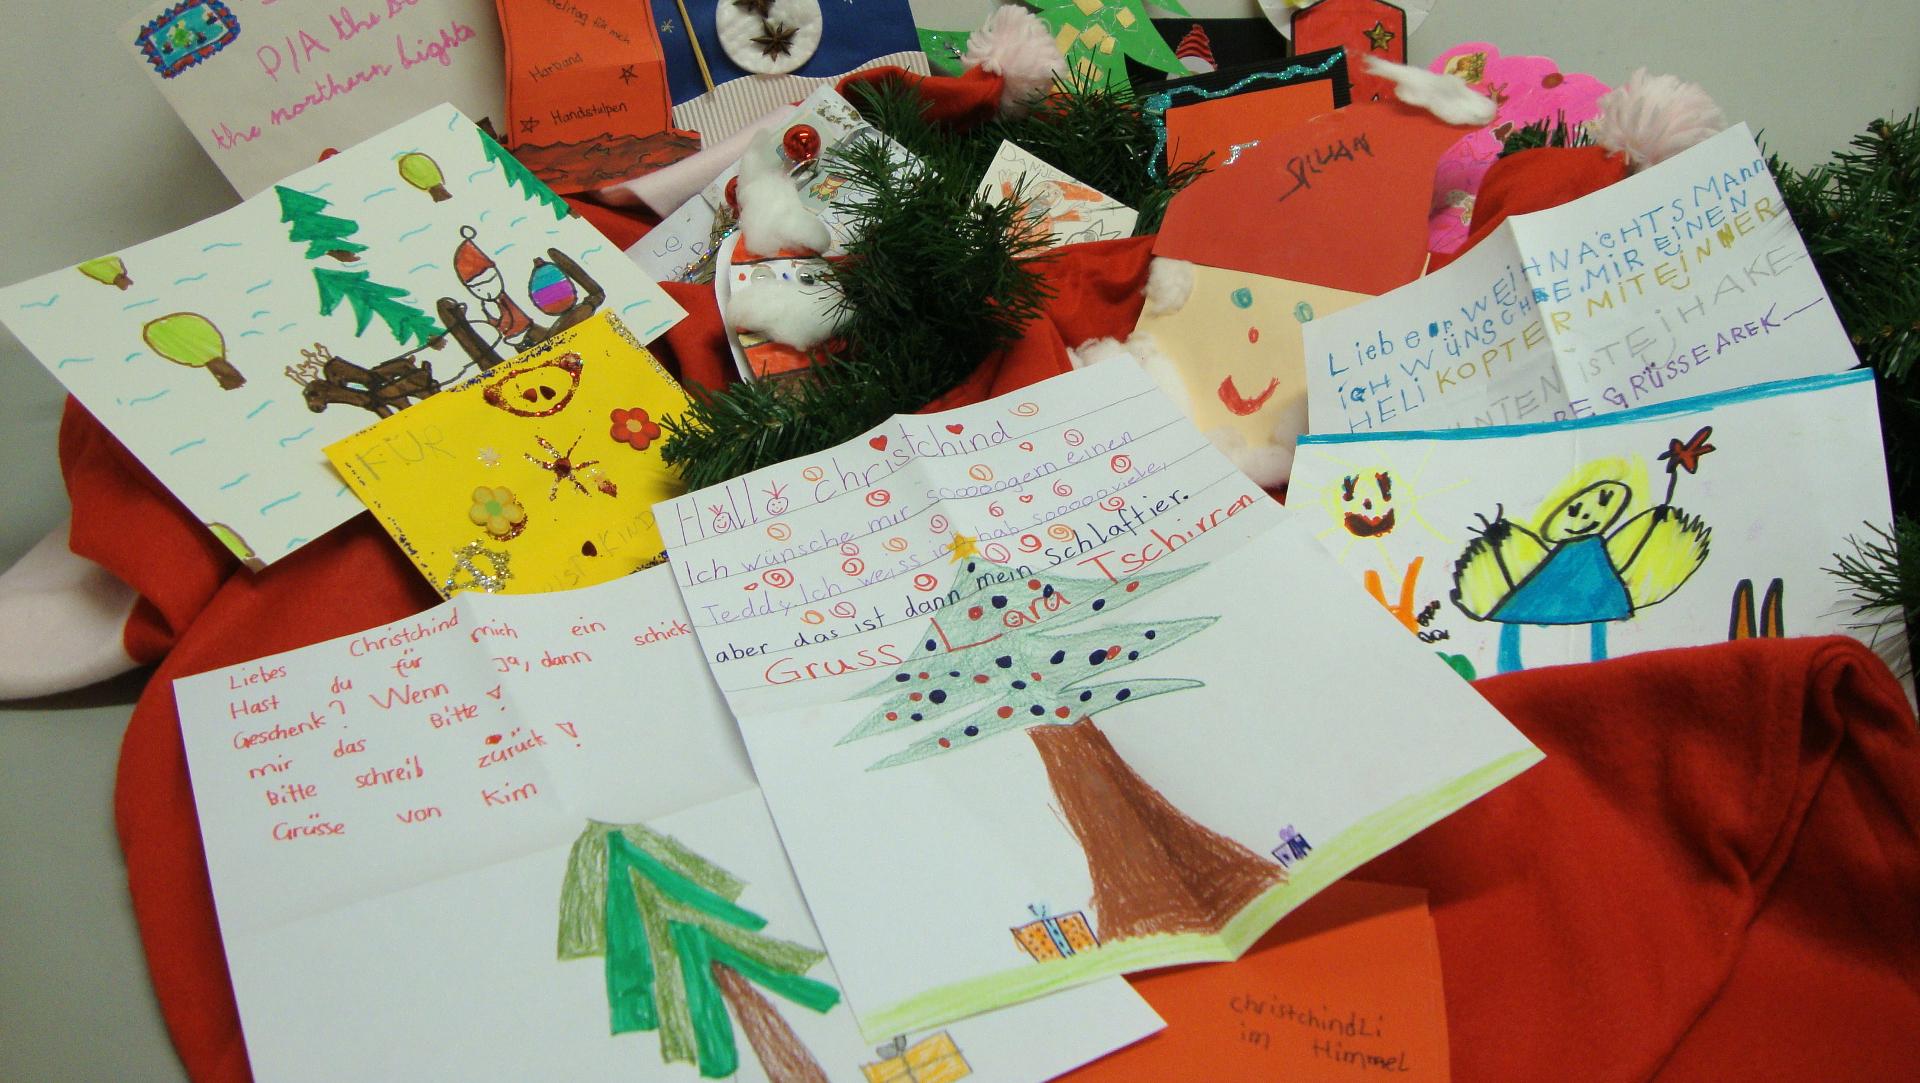 Briefe Ans Christkind Kinder : Christkind antwortet auf über briefe von kindern